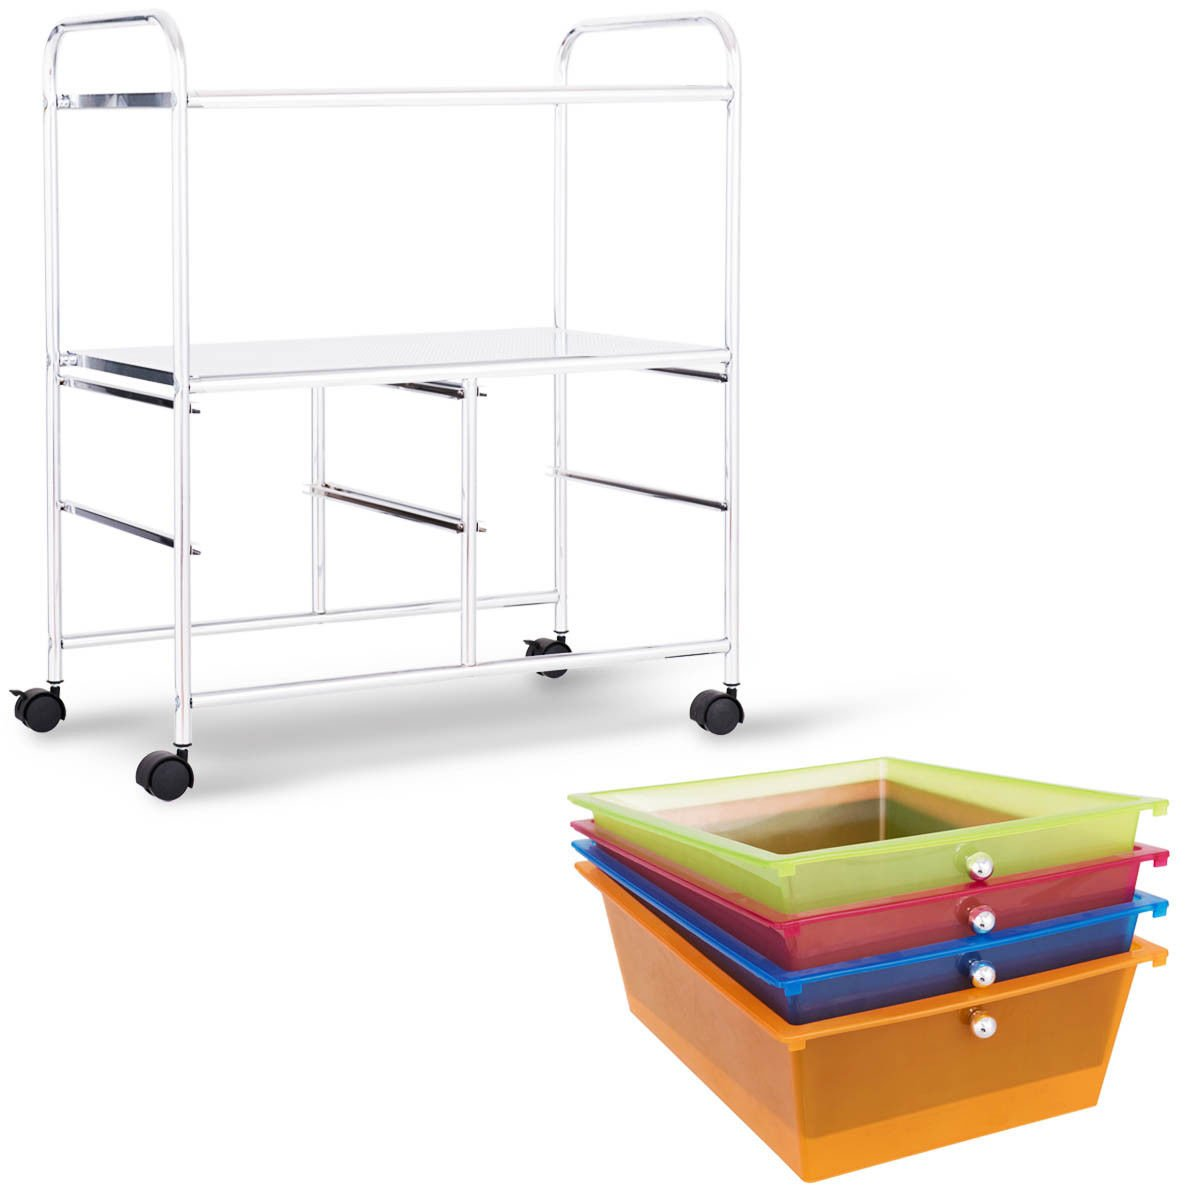 Giantex Rolling Storage Cart w/ 4 Drawers 2 Shelves Metal Rack Shelf Home Office School Beauty Salon Utility Organizer Cart with Wheels (Blue Green Orange & Red) by Giantex (Image #5)